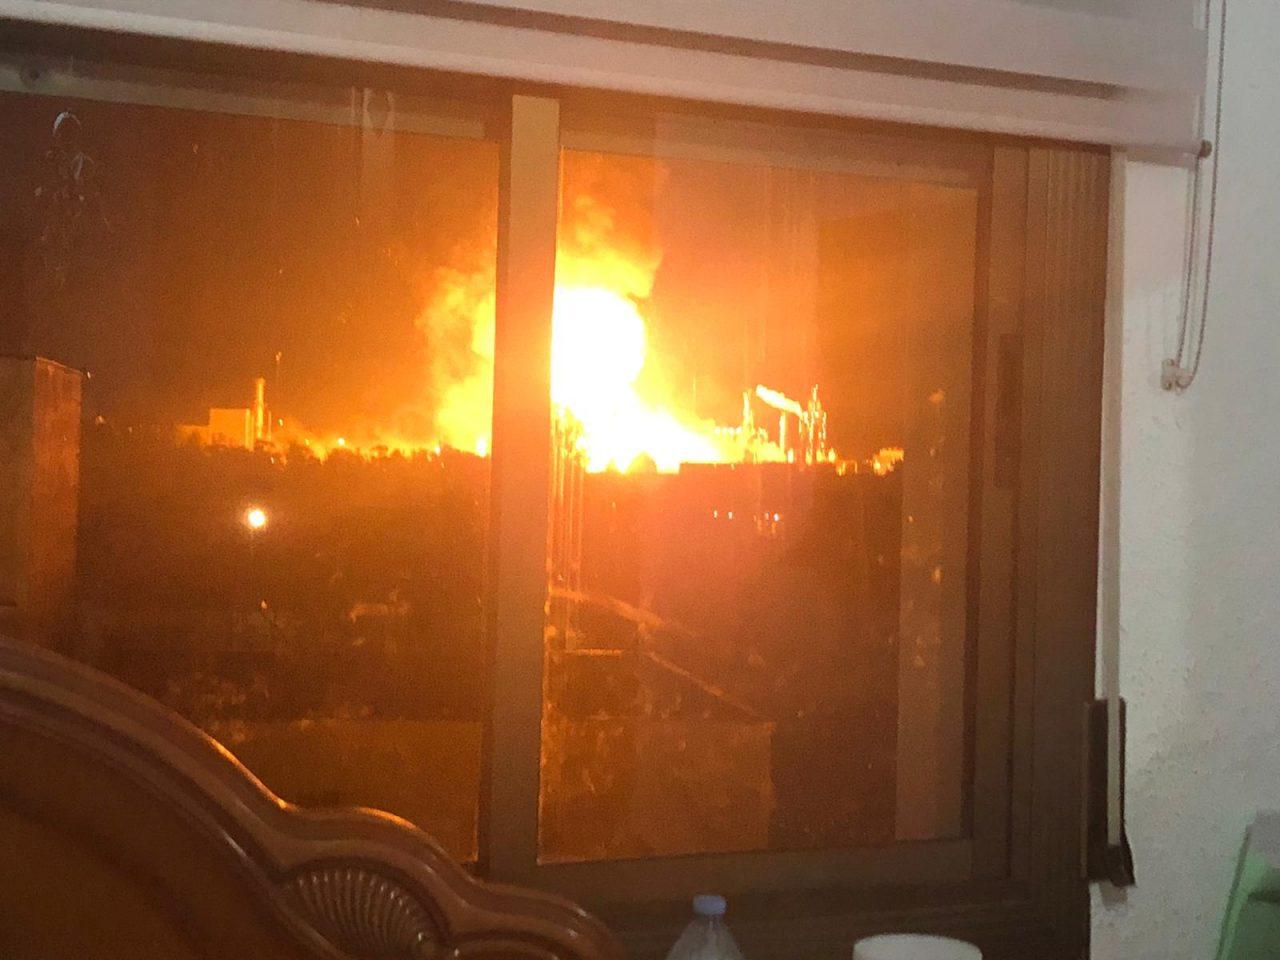 incendi_basf-1280x960.jpg